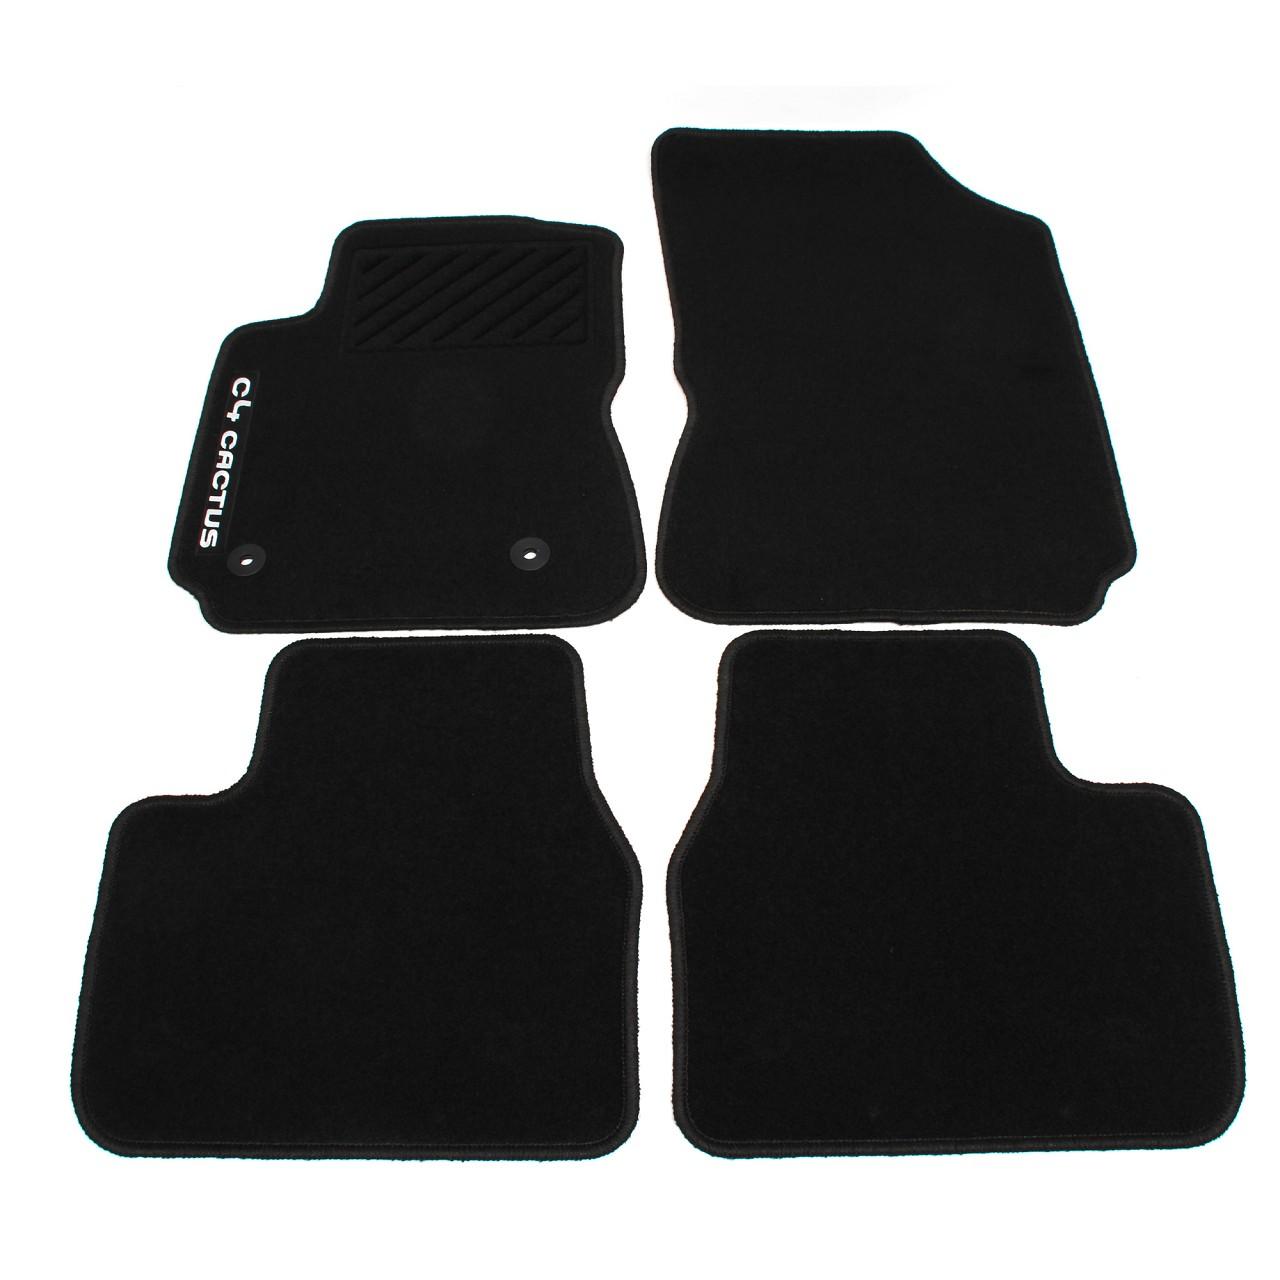 ORIGINAL Citroen Textilmatten Fußmatten Automatten Satz C4 CACTUS 1611102680